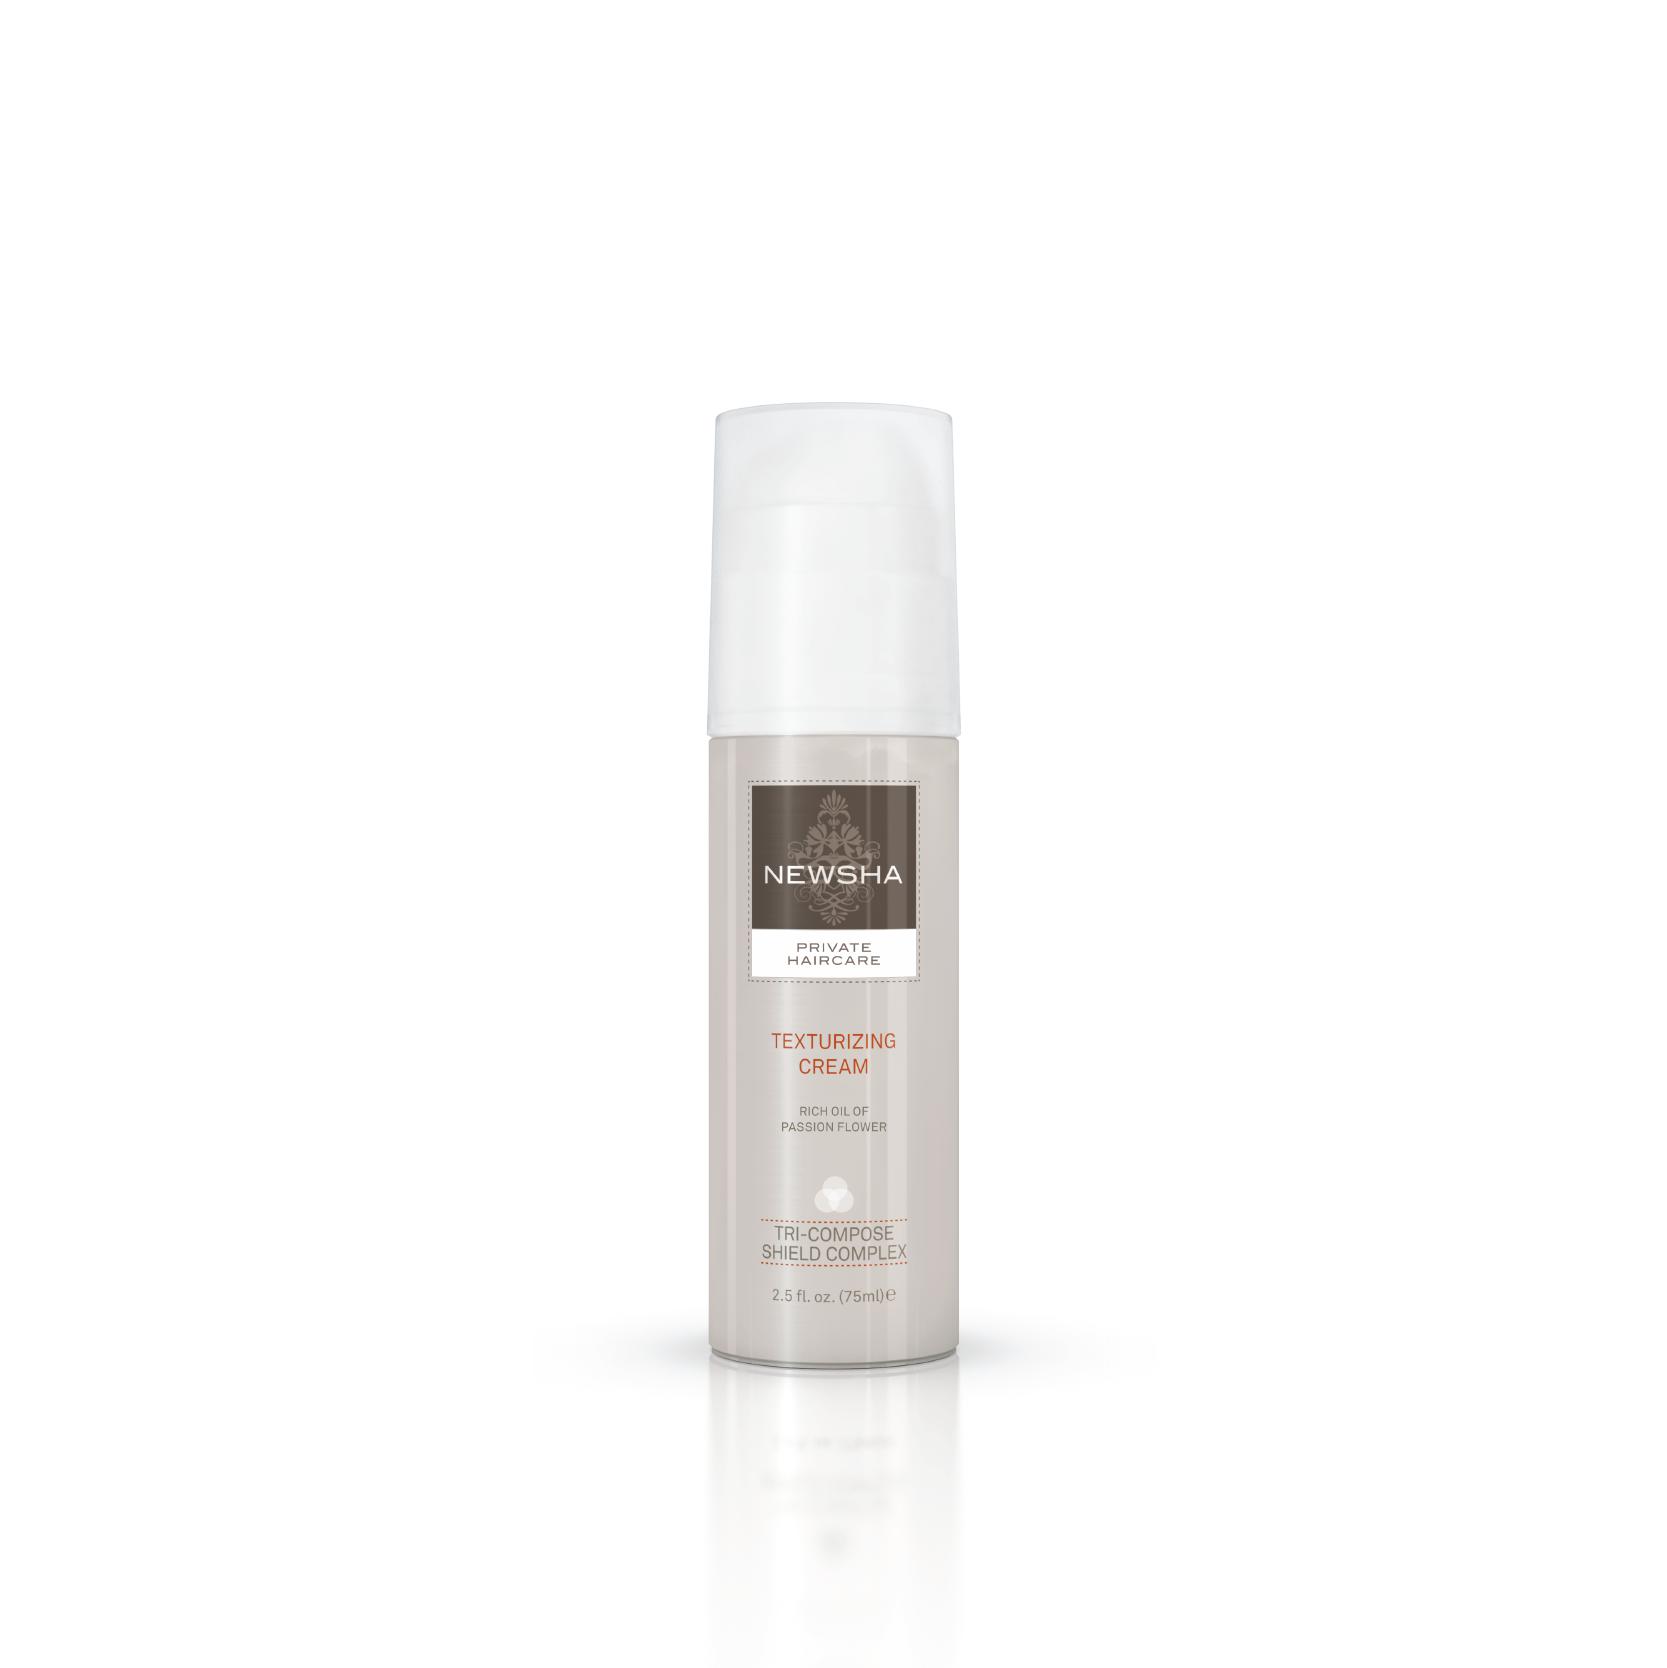 Newsha Product Shots-Texturizing Cream.png